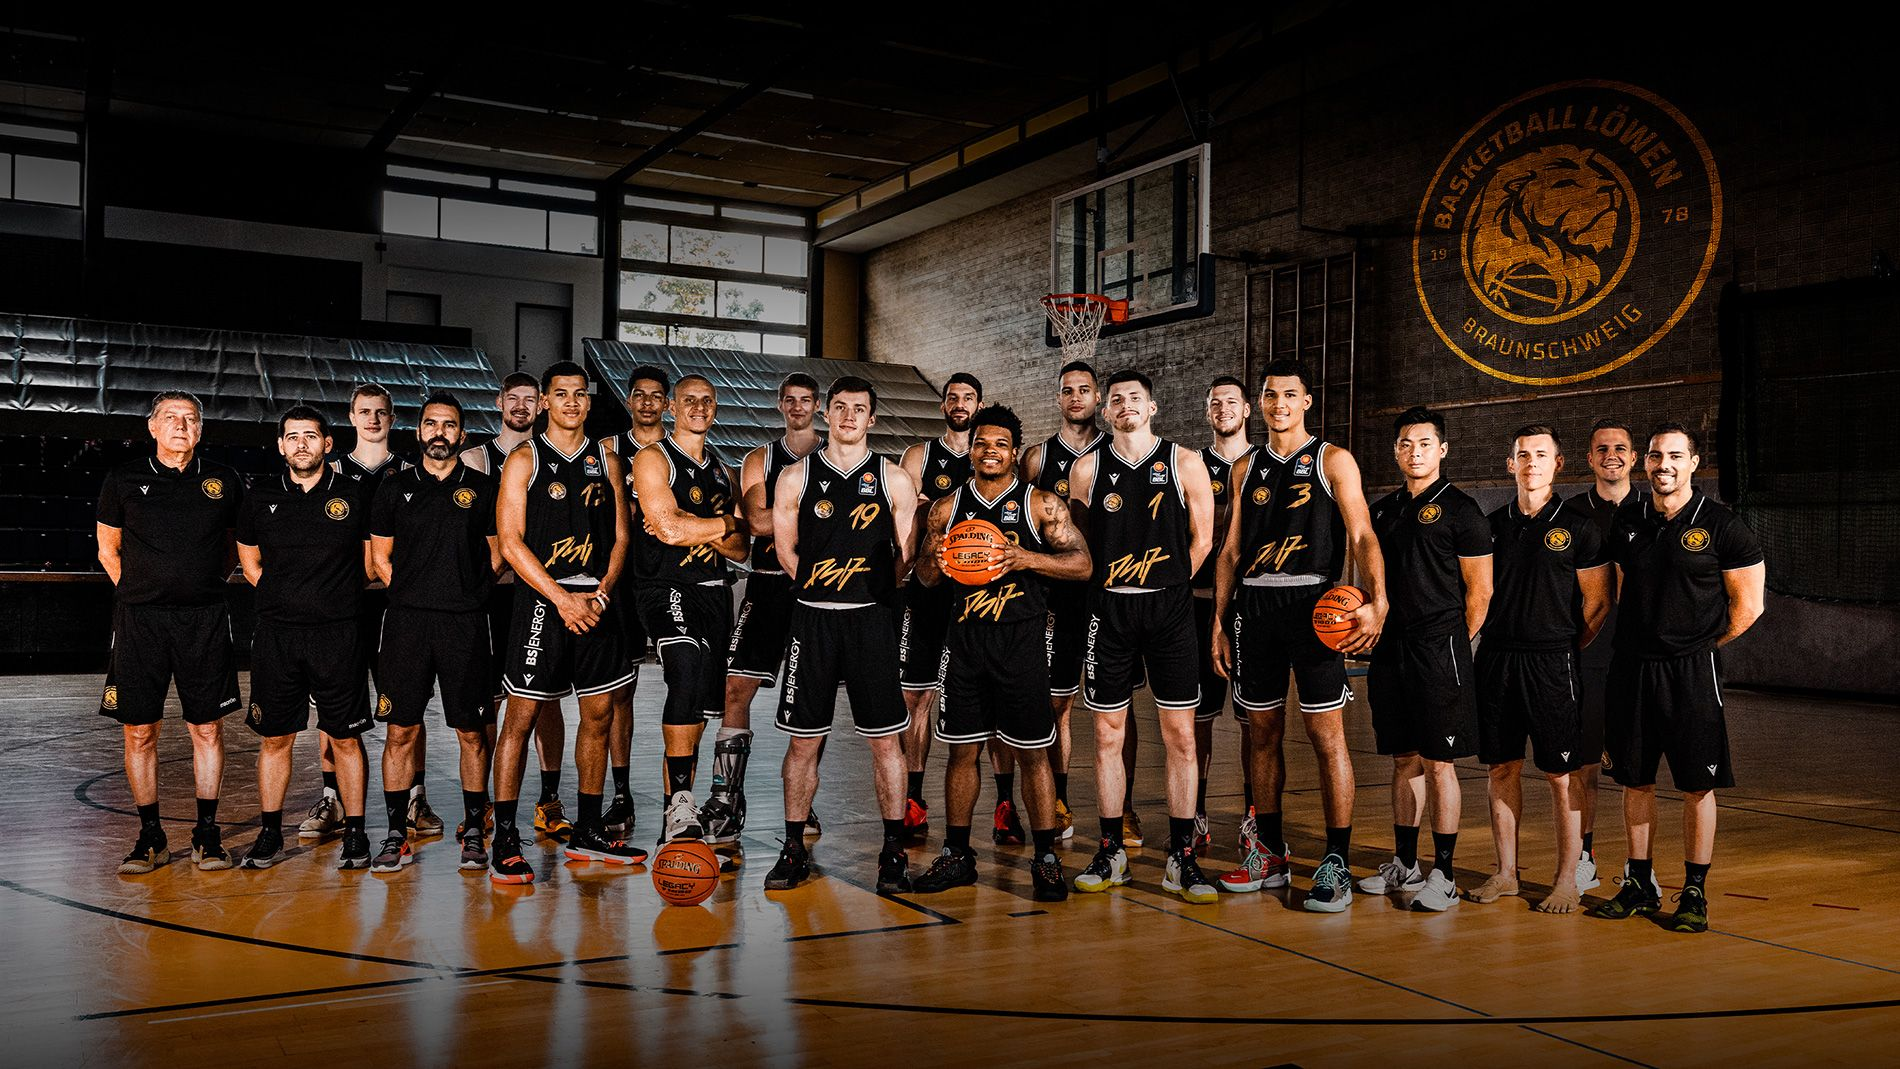 Basketball Braunchweig